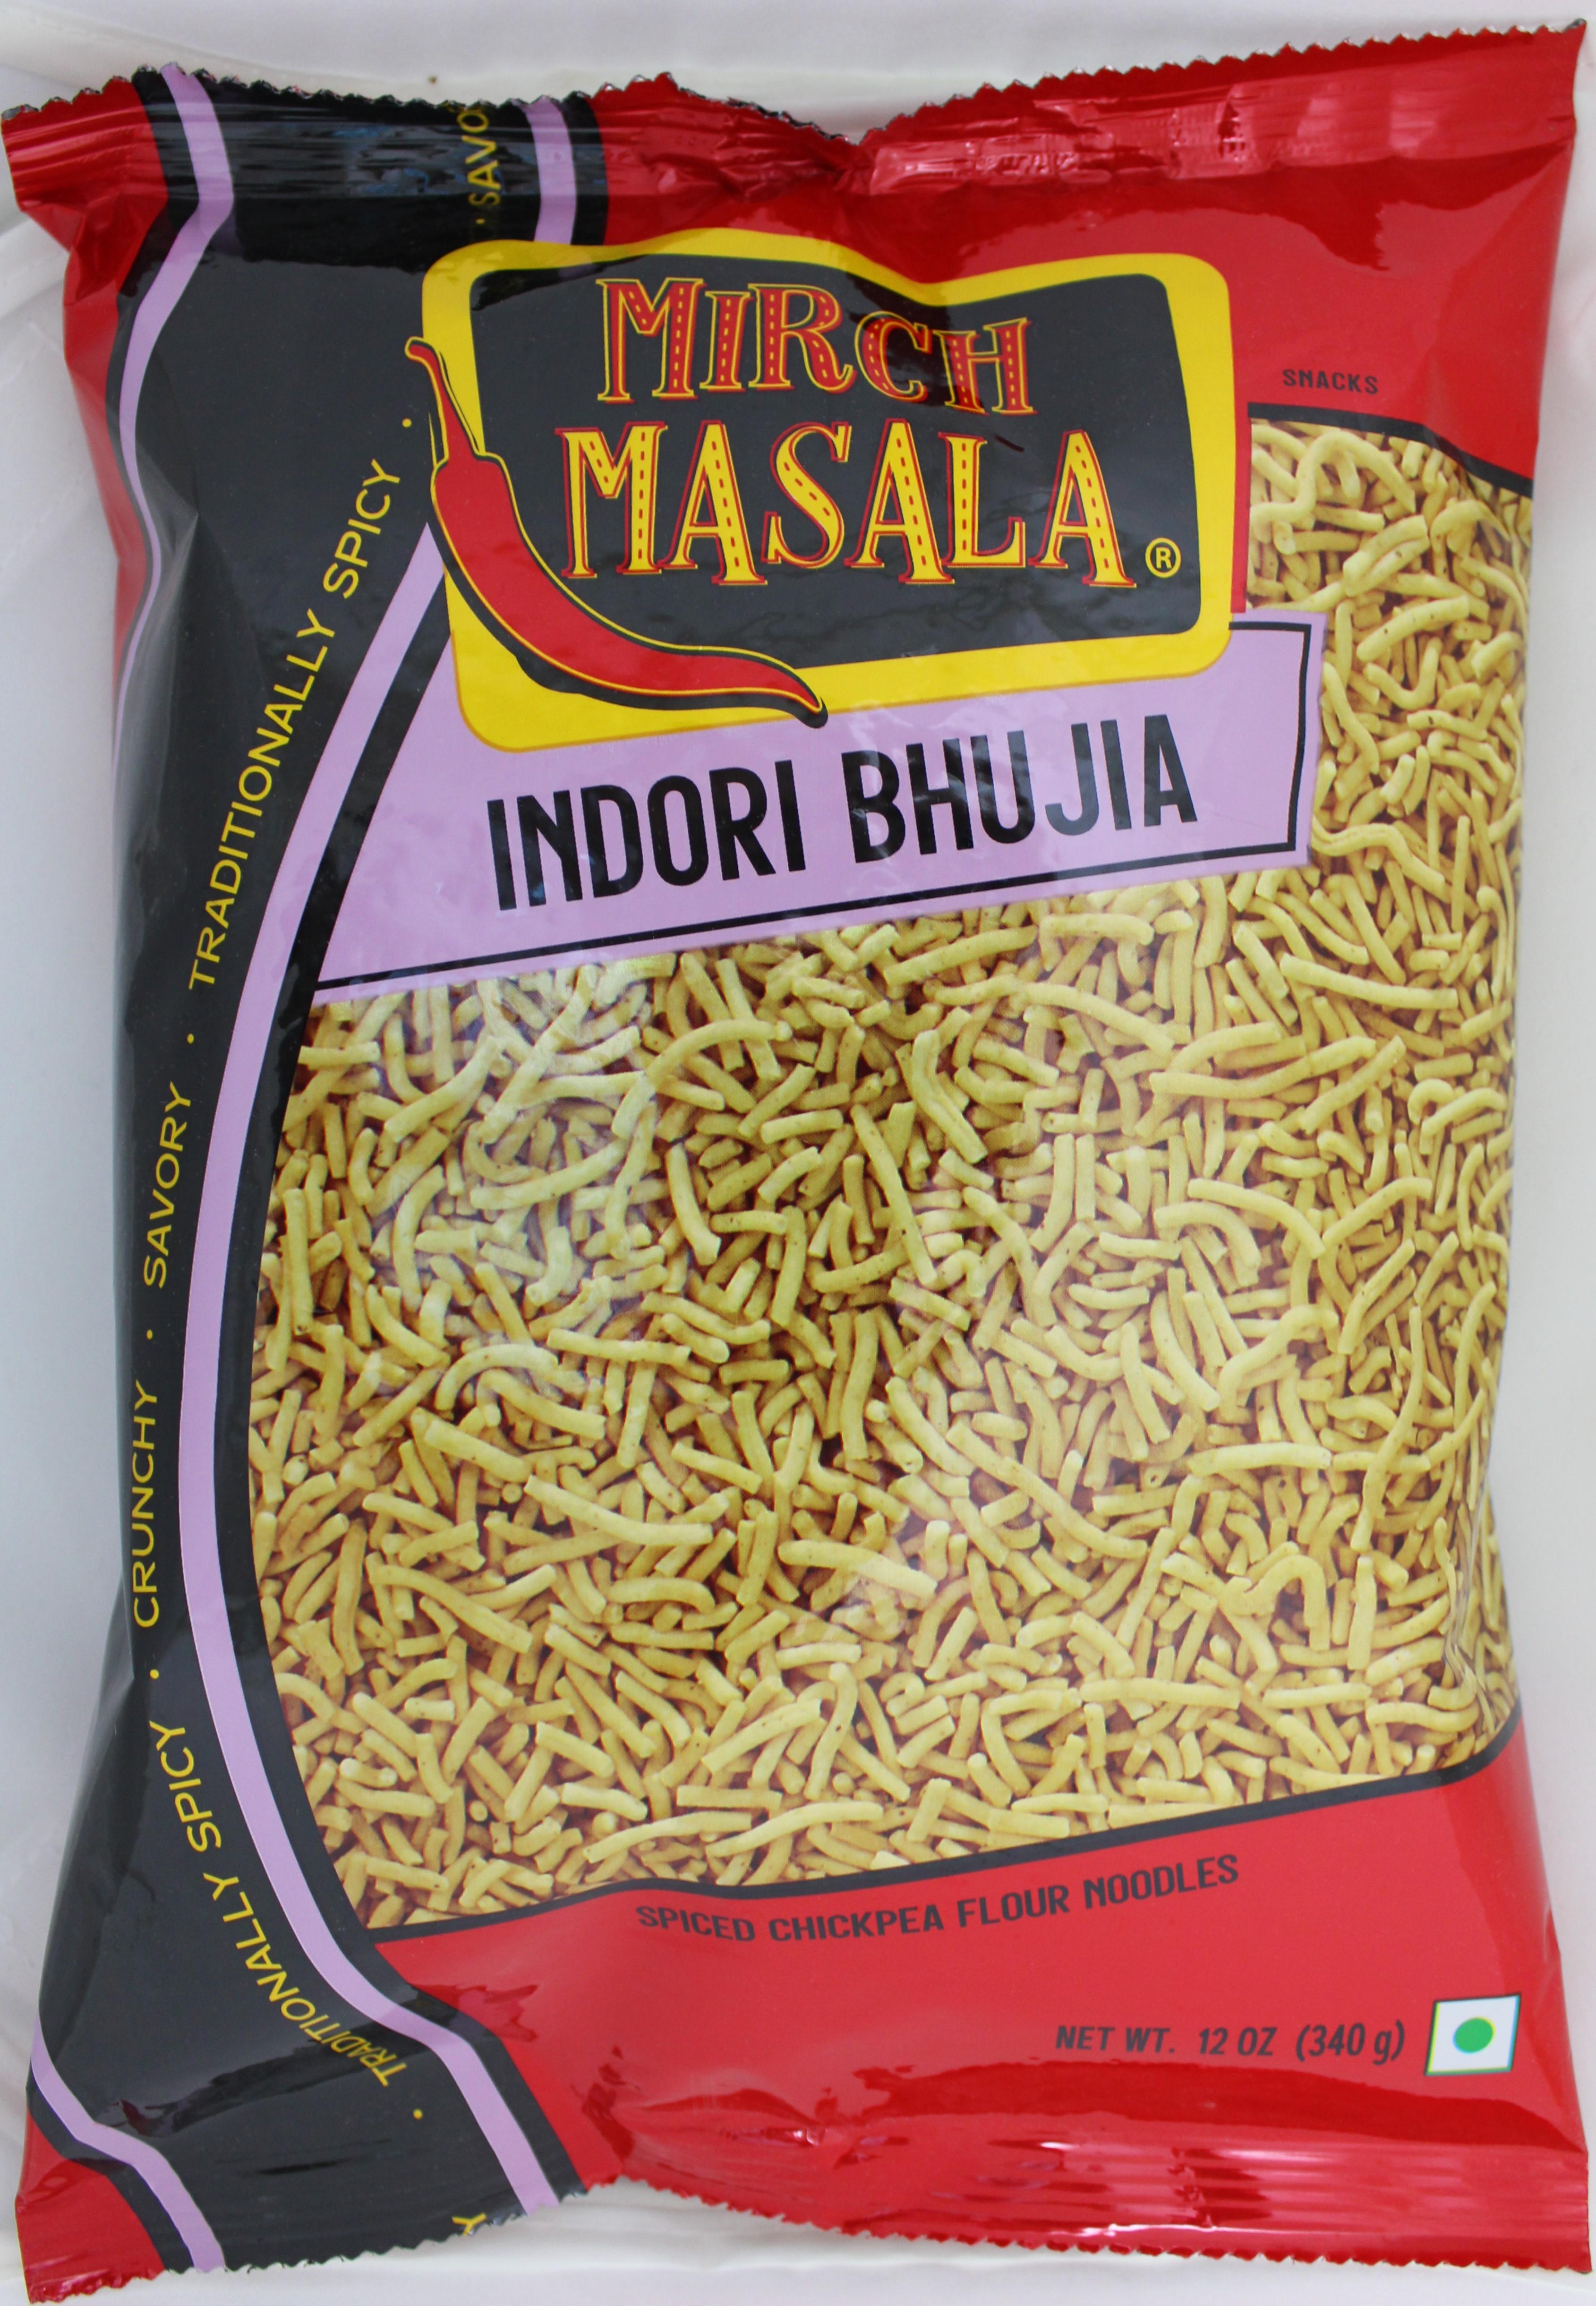 Indori Bhujia 12oz.